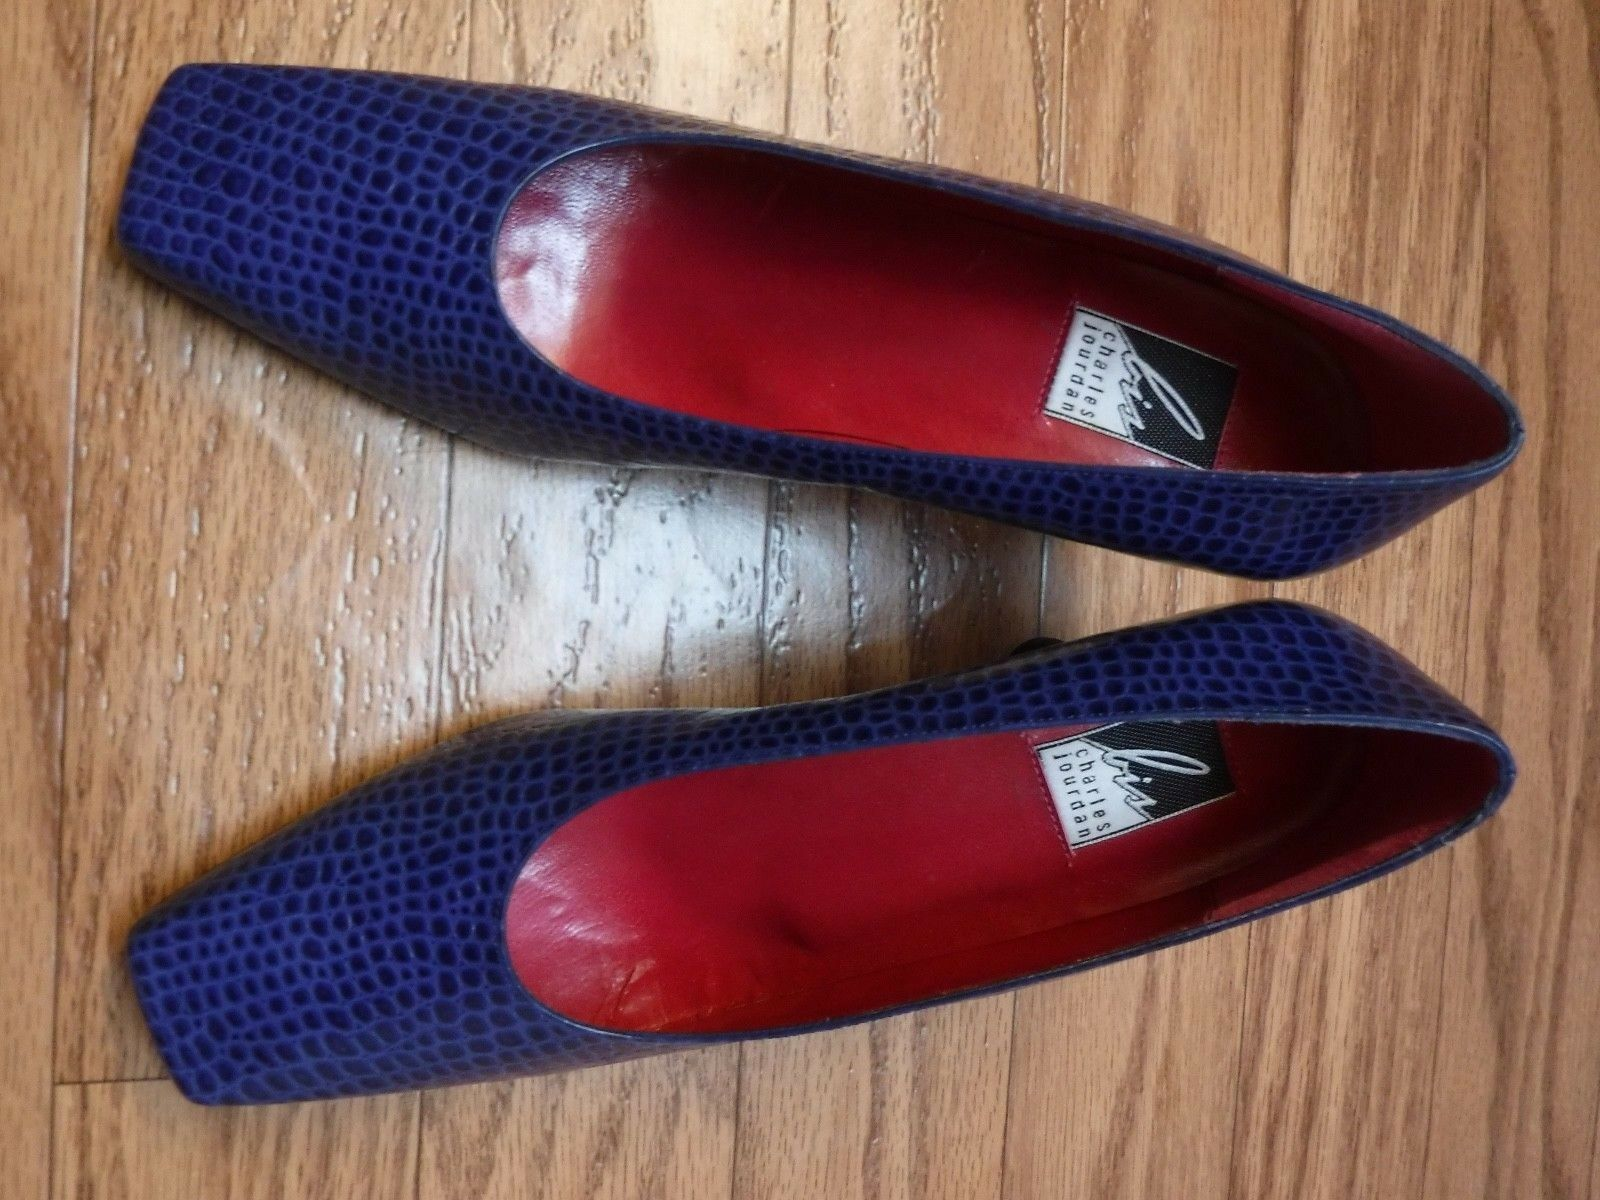 Charles Jourdan SAY 60 13 Blau Leather Upper Upper Upper Animal Print schuhe damen 91 2NWOB e9e639